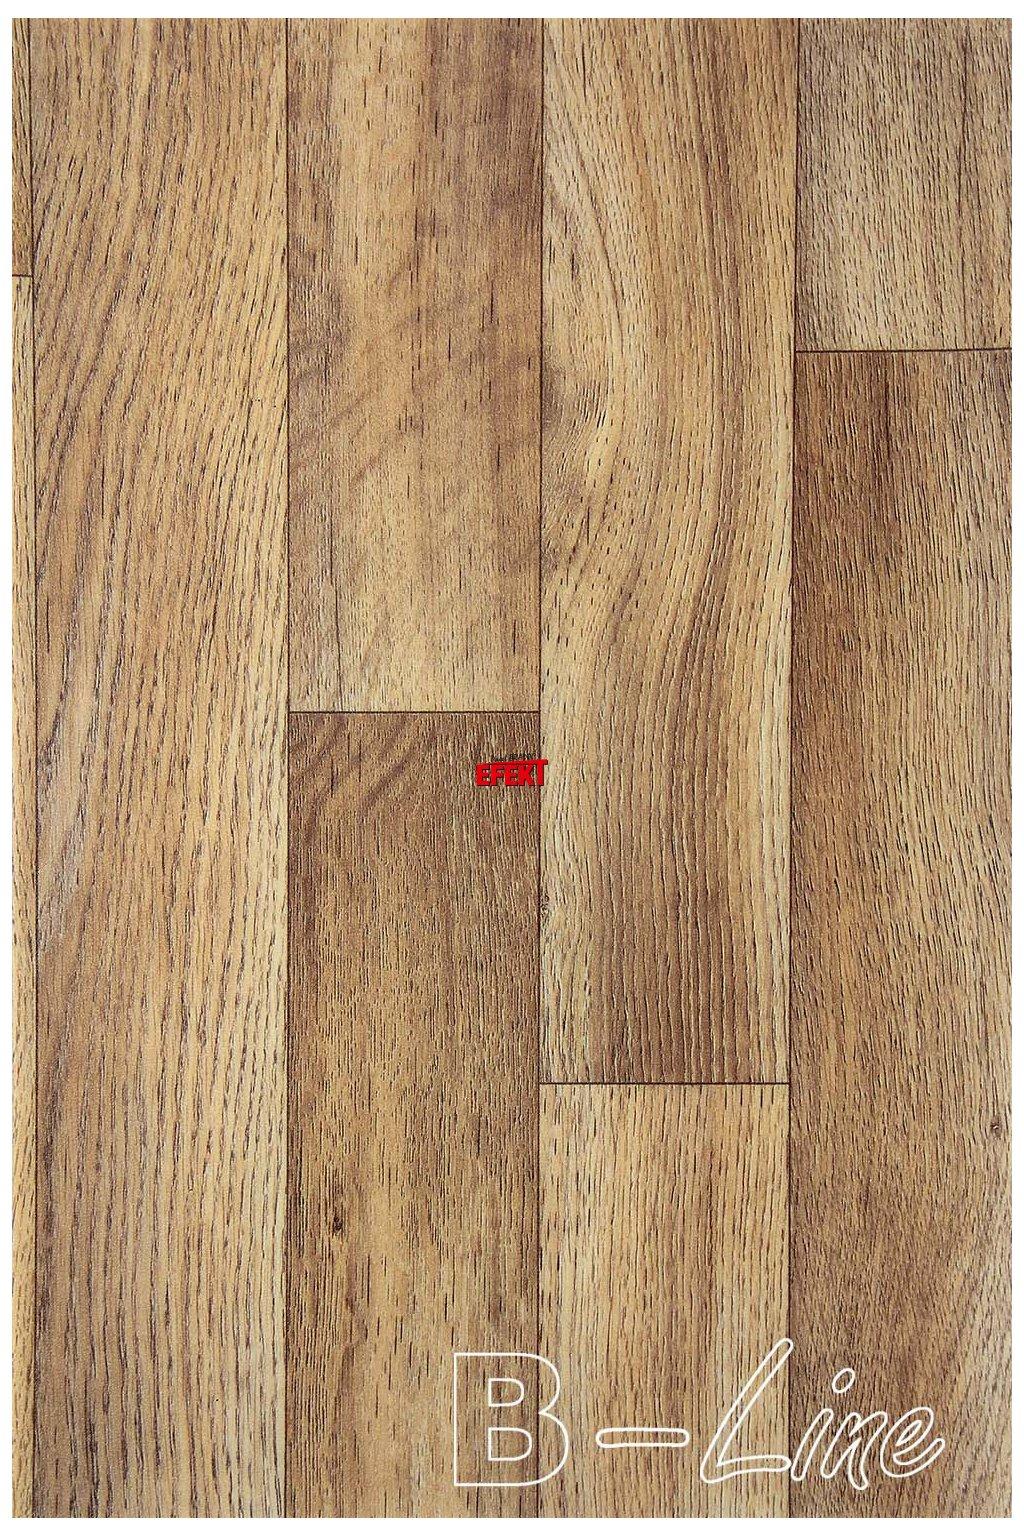 Xtreme-Golden Oak 690L